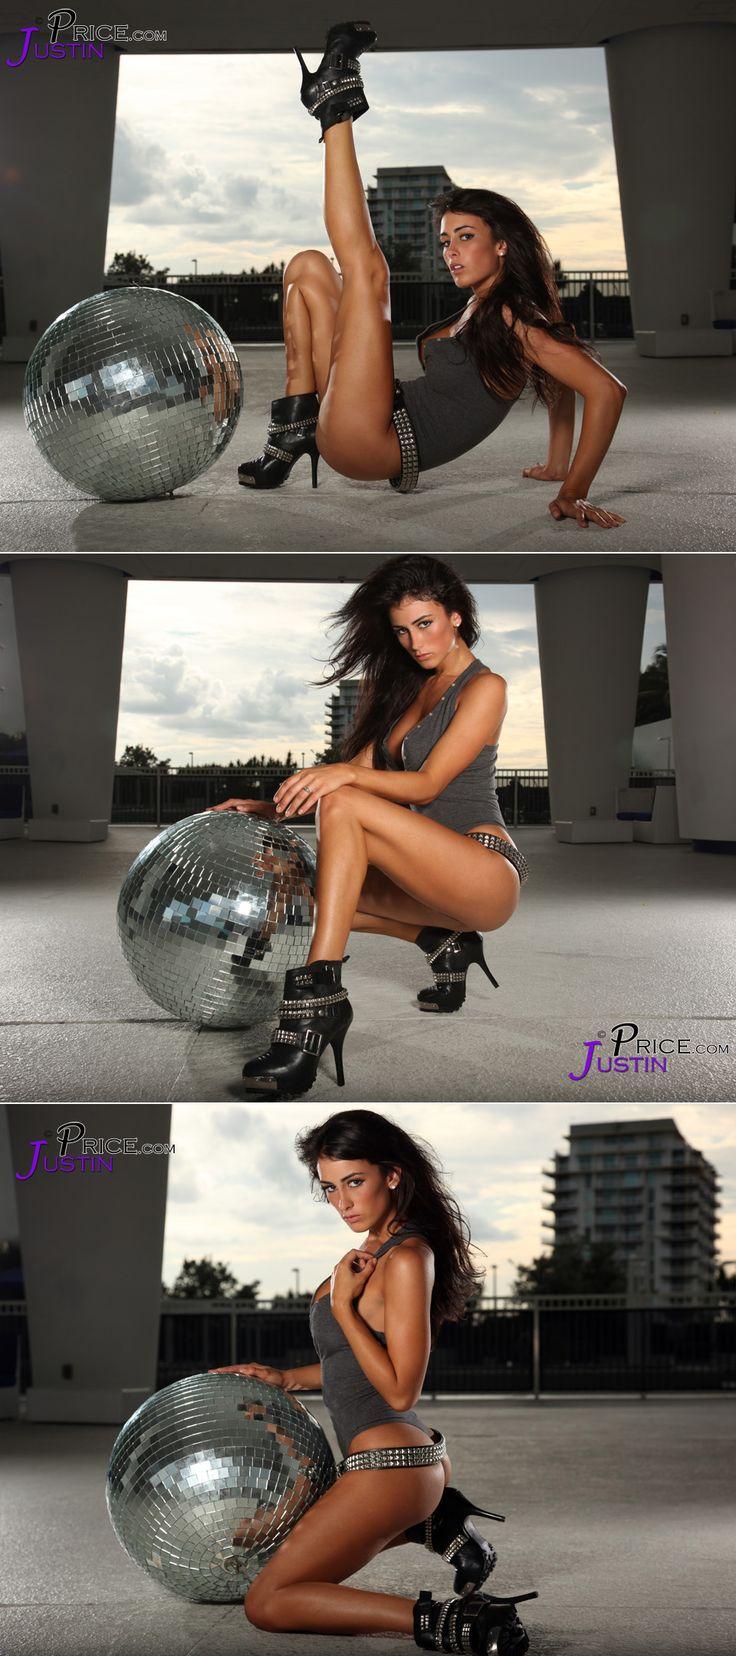 Fitness & Glamour | Justin Price Miami L.A. Vegas ...